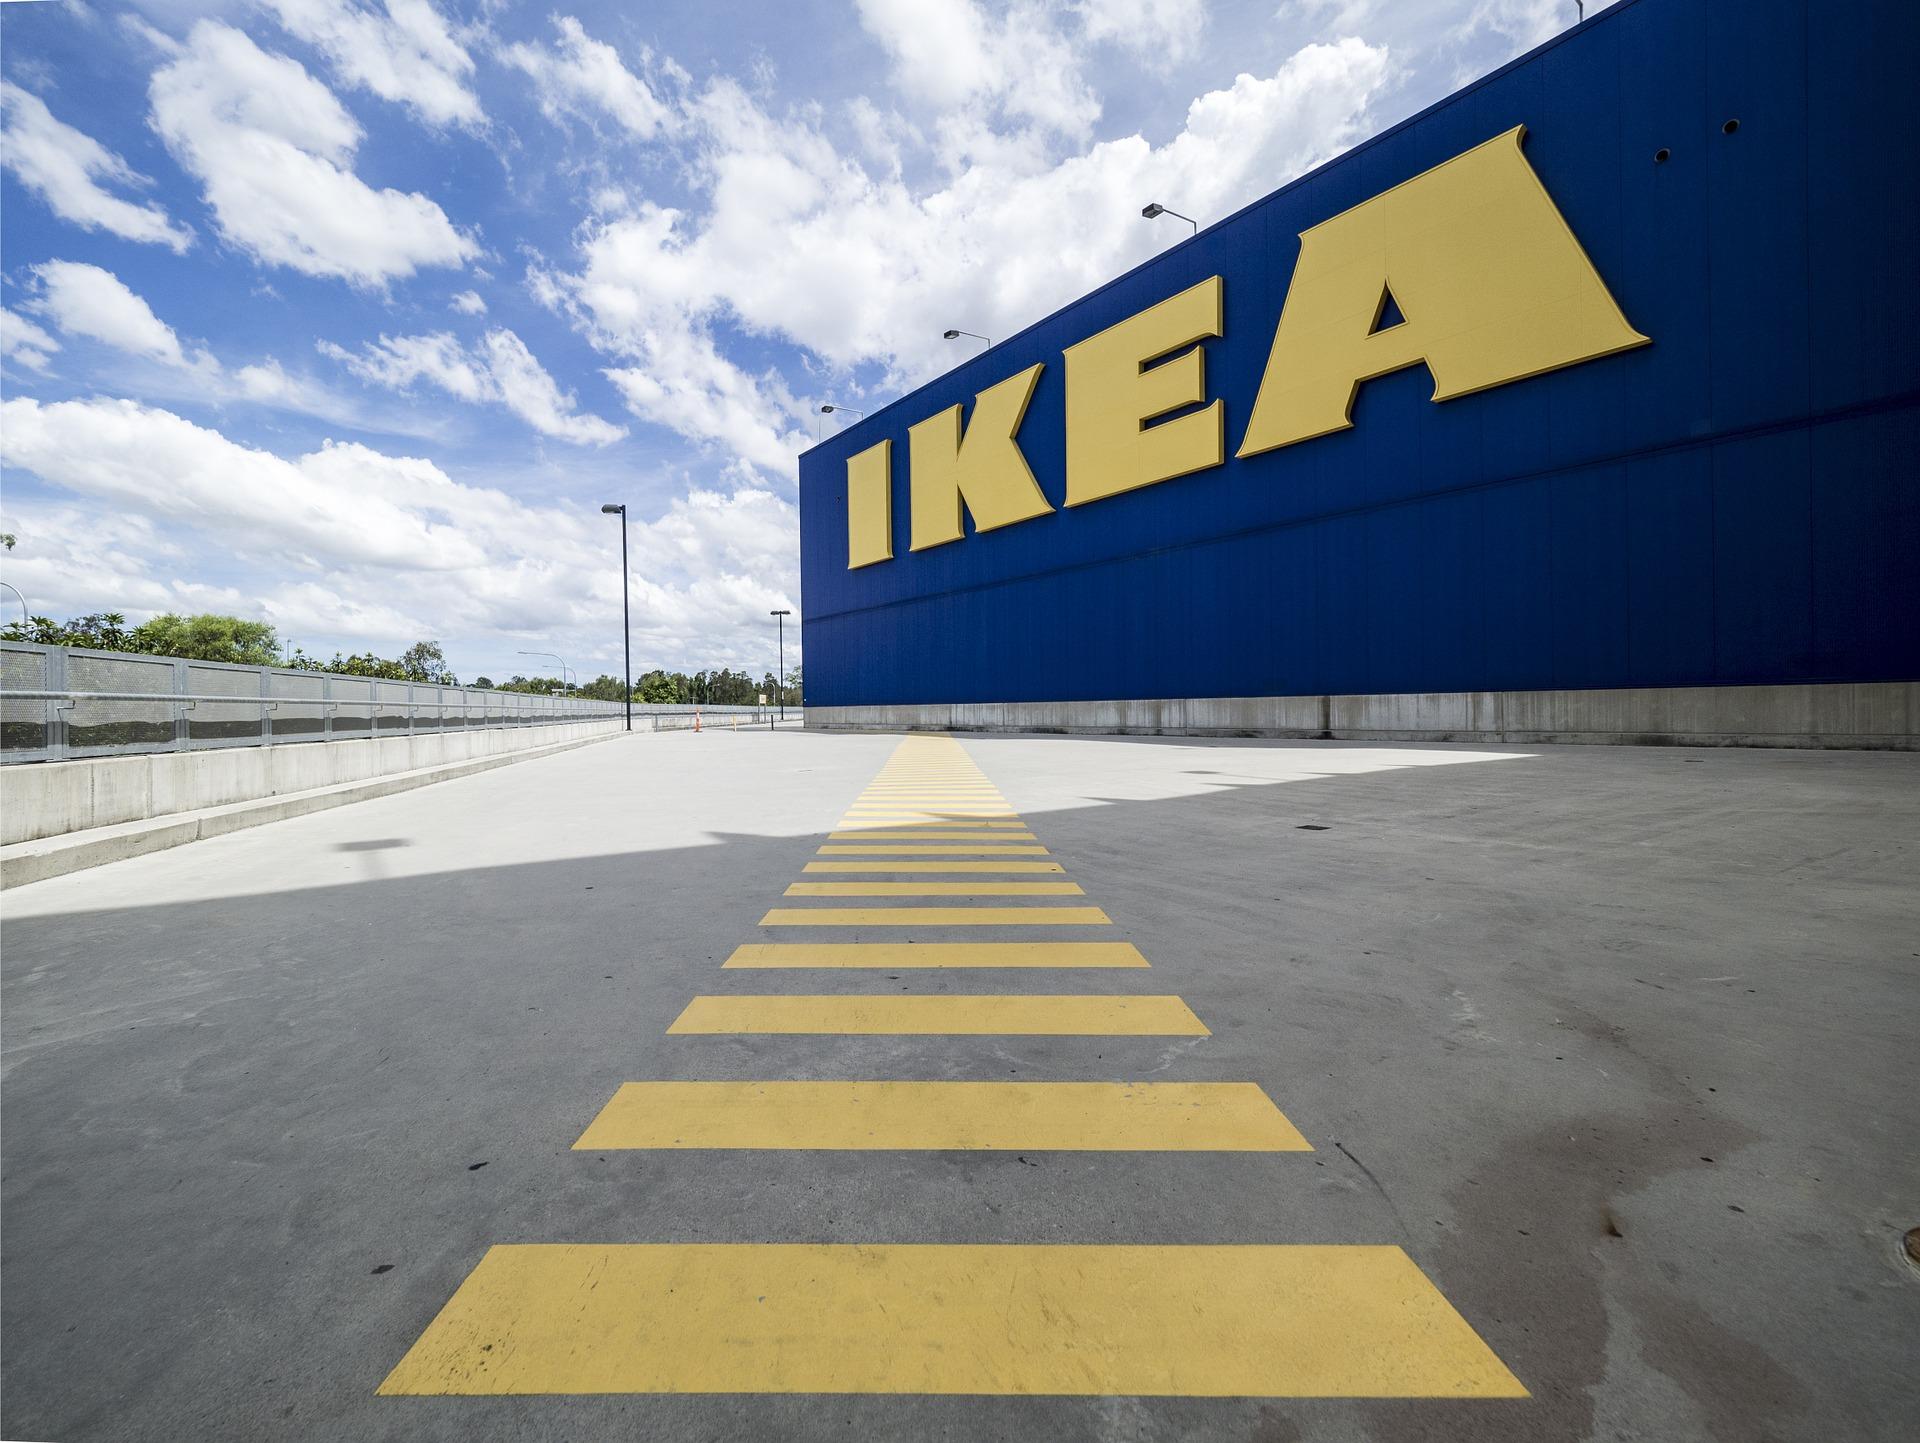 Om svenske grenser, smarte hoder og skarpe kniver